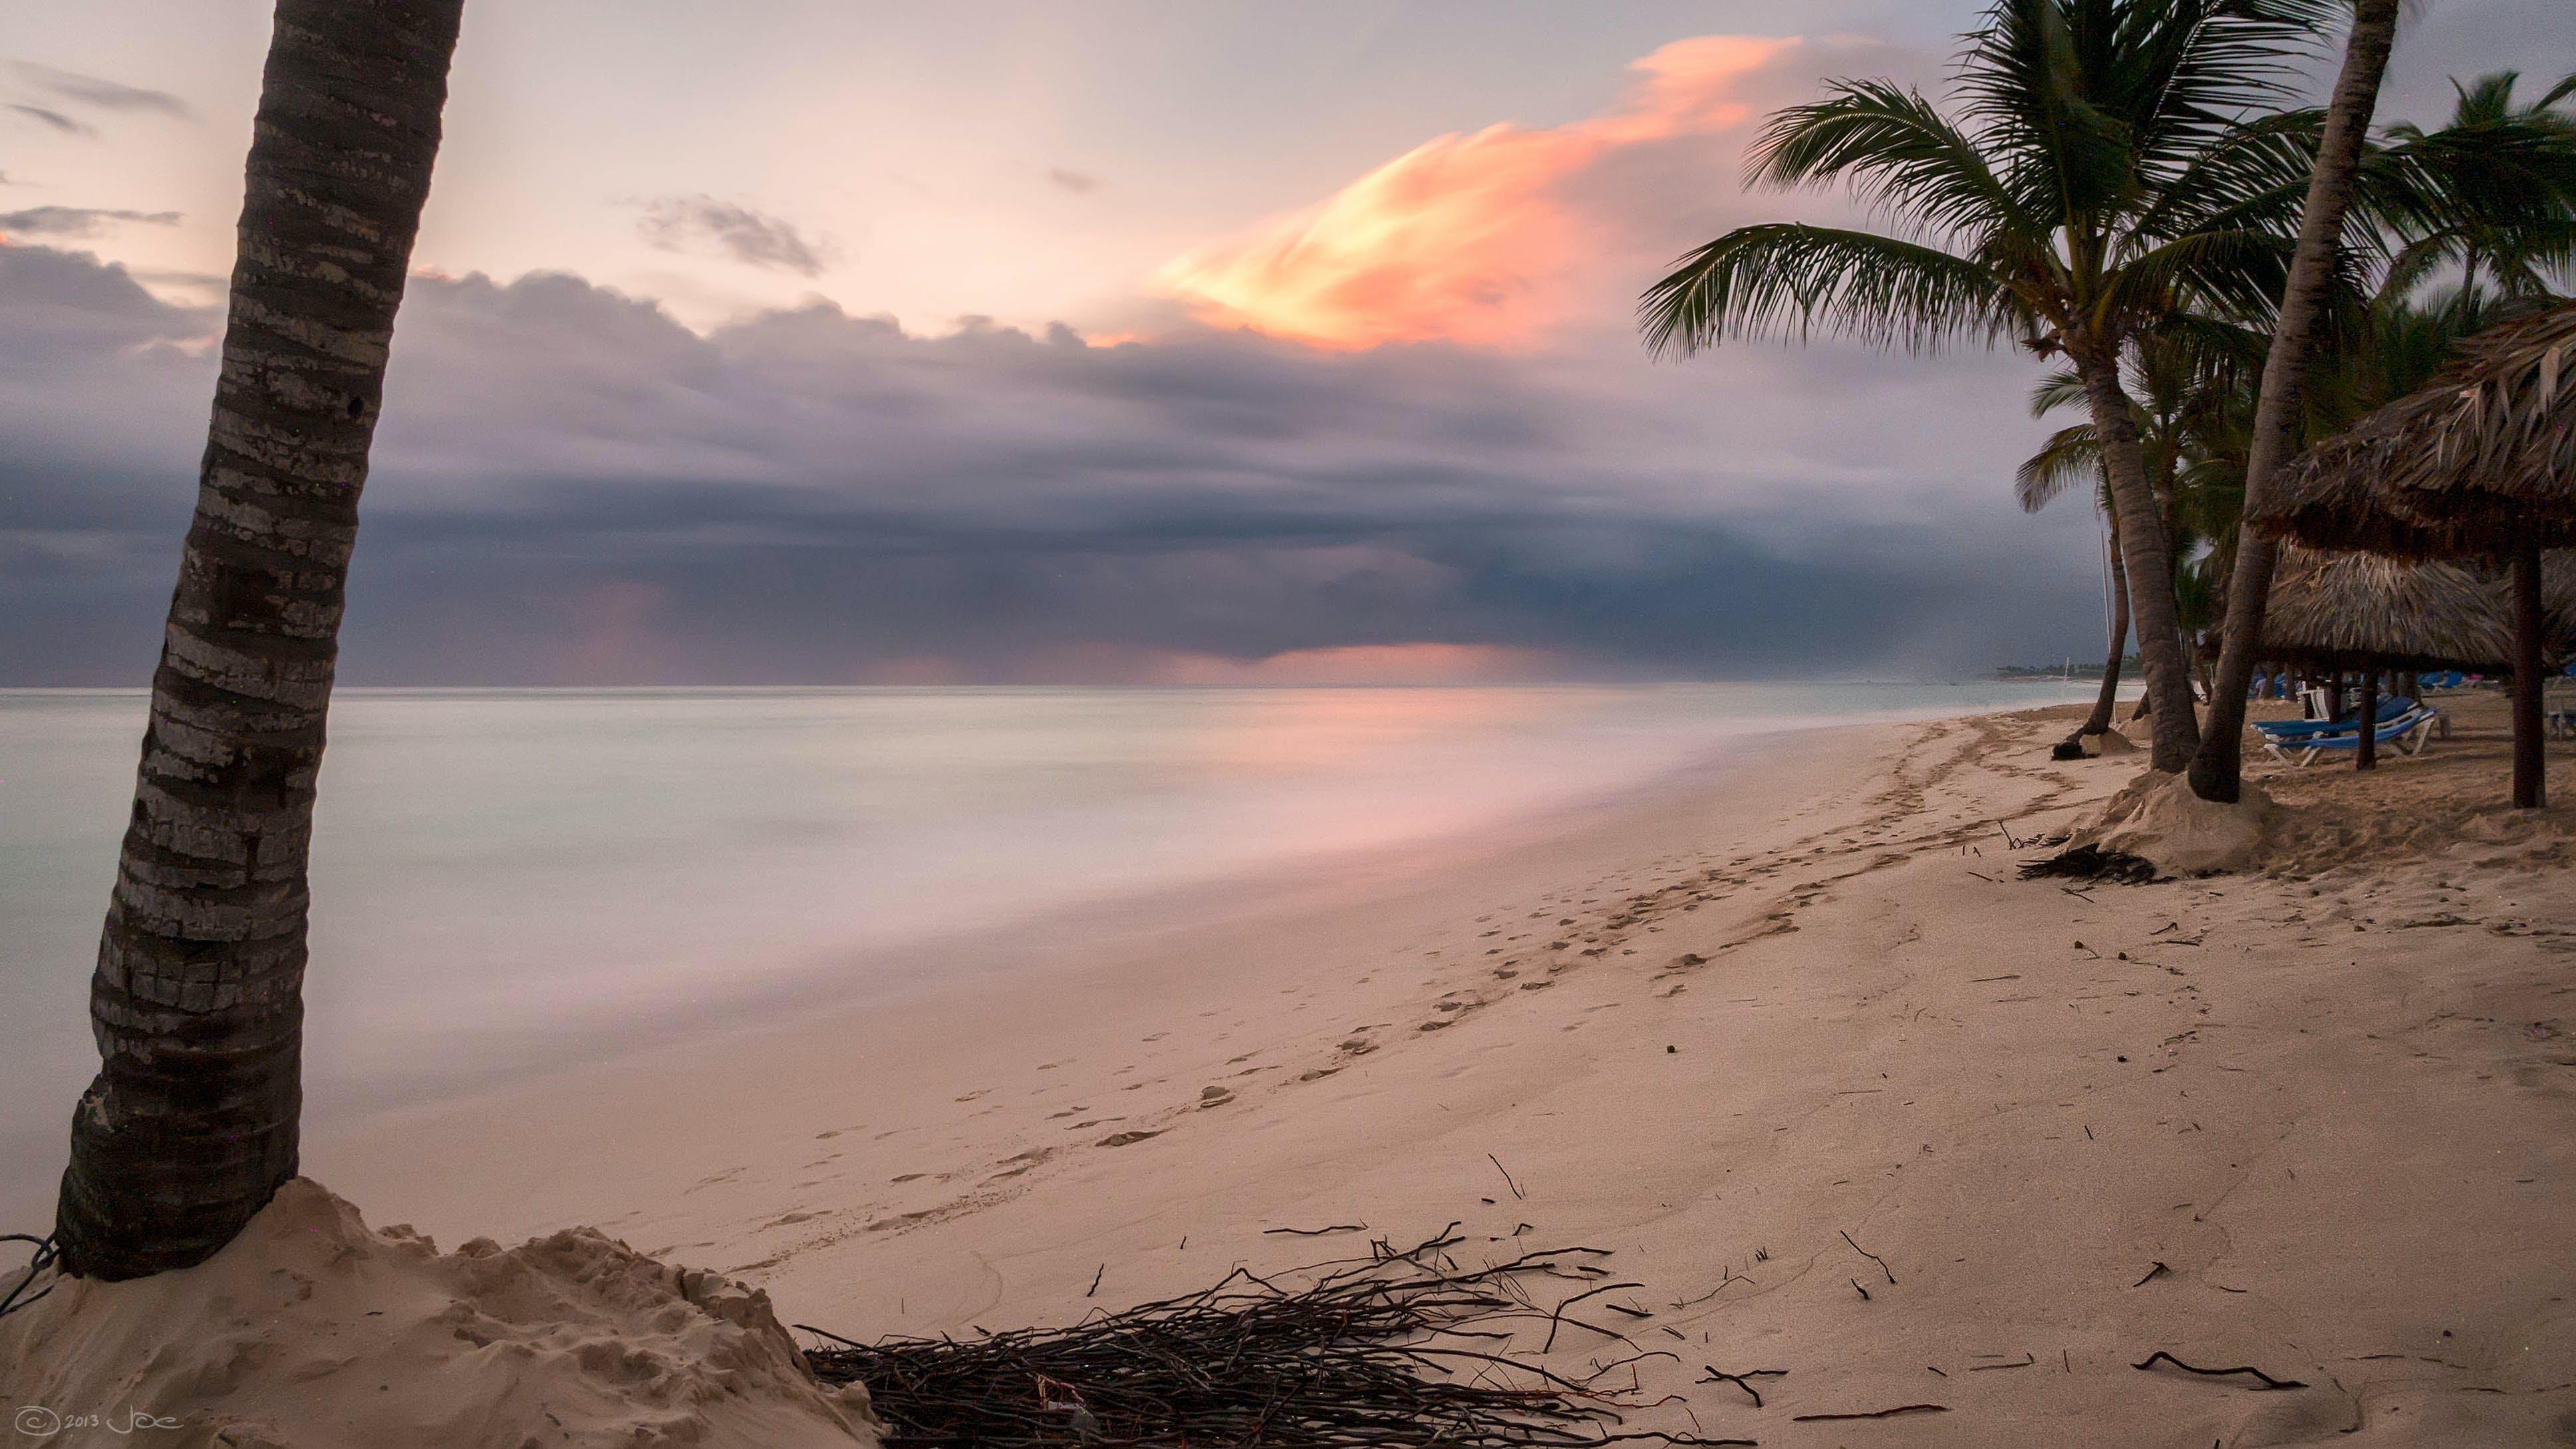 Palm Tree on Shore Near Body of Water Under Orange Sunset